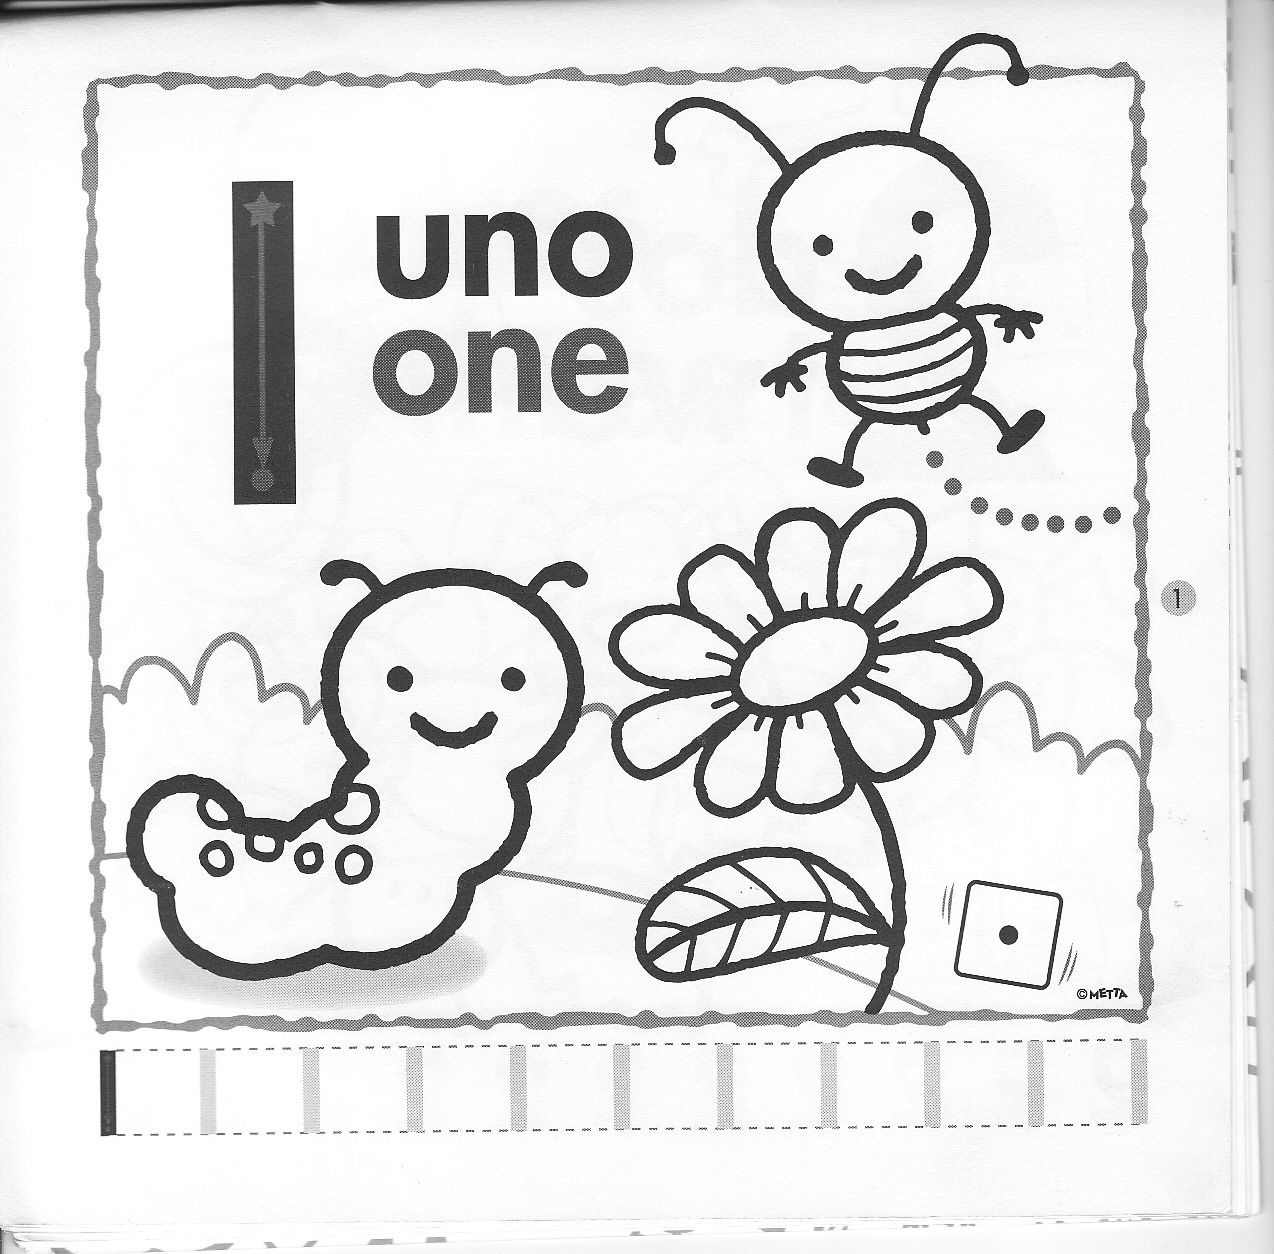 Fichas De Ingles Para Ninos Fichas De Numeros En Ingles Cuaderno De Ingles Numeros En Ingles Ingles Para Preescolar